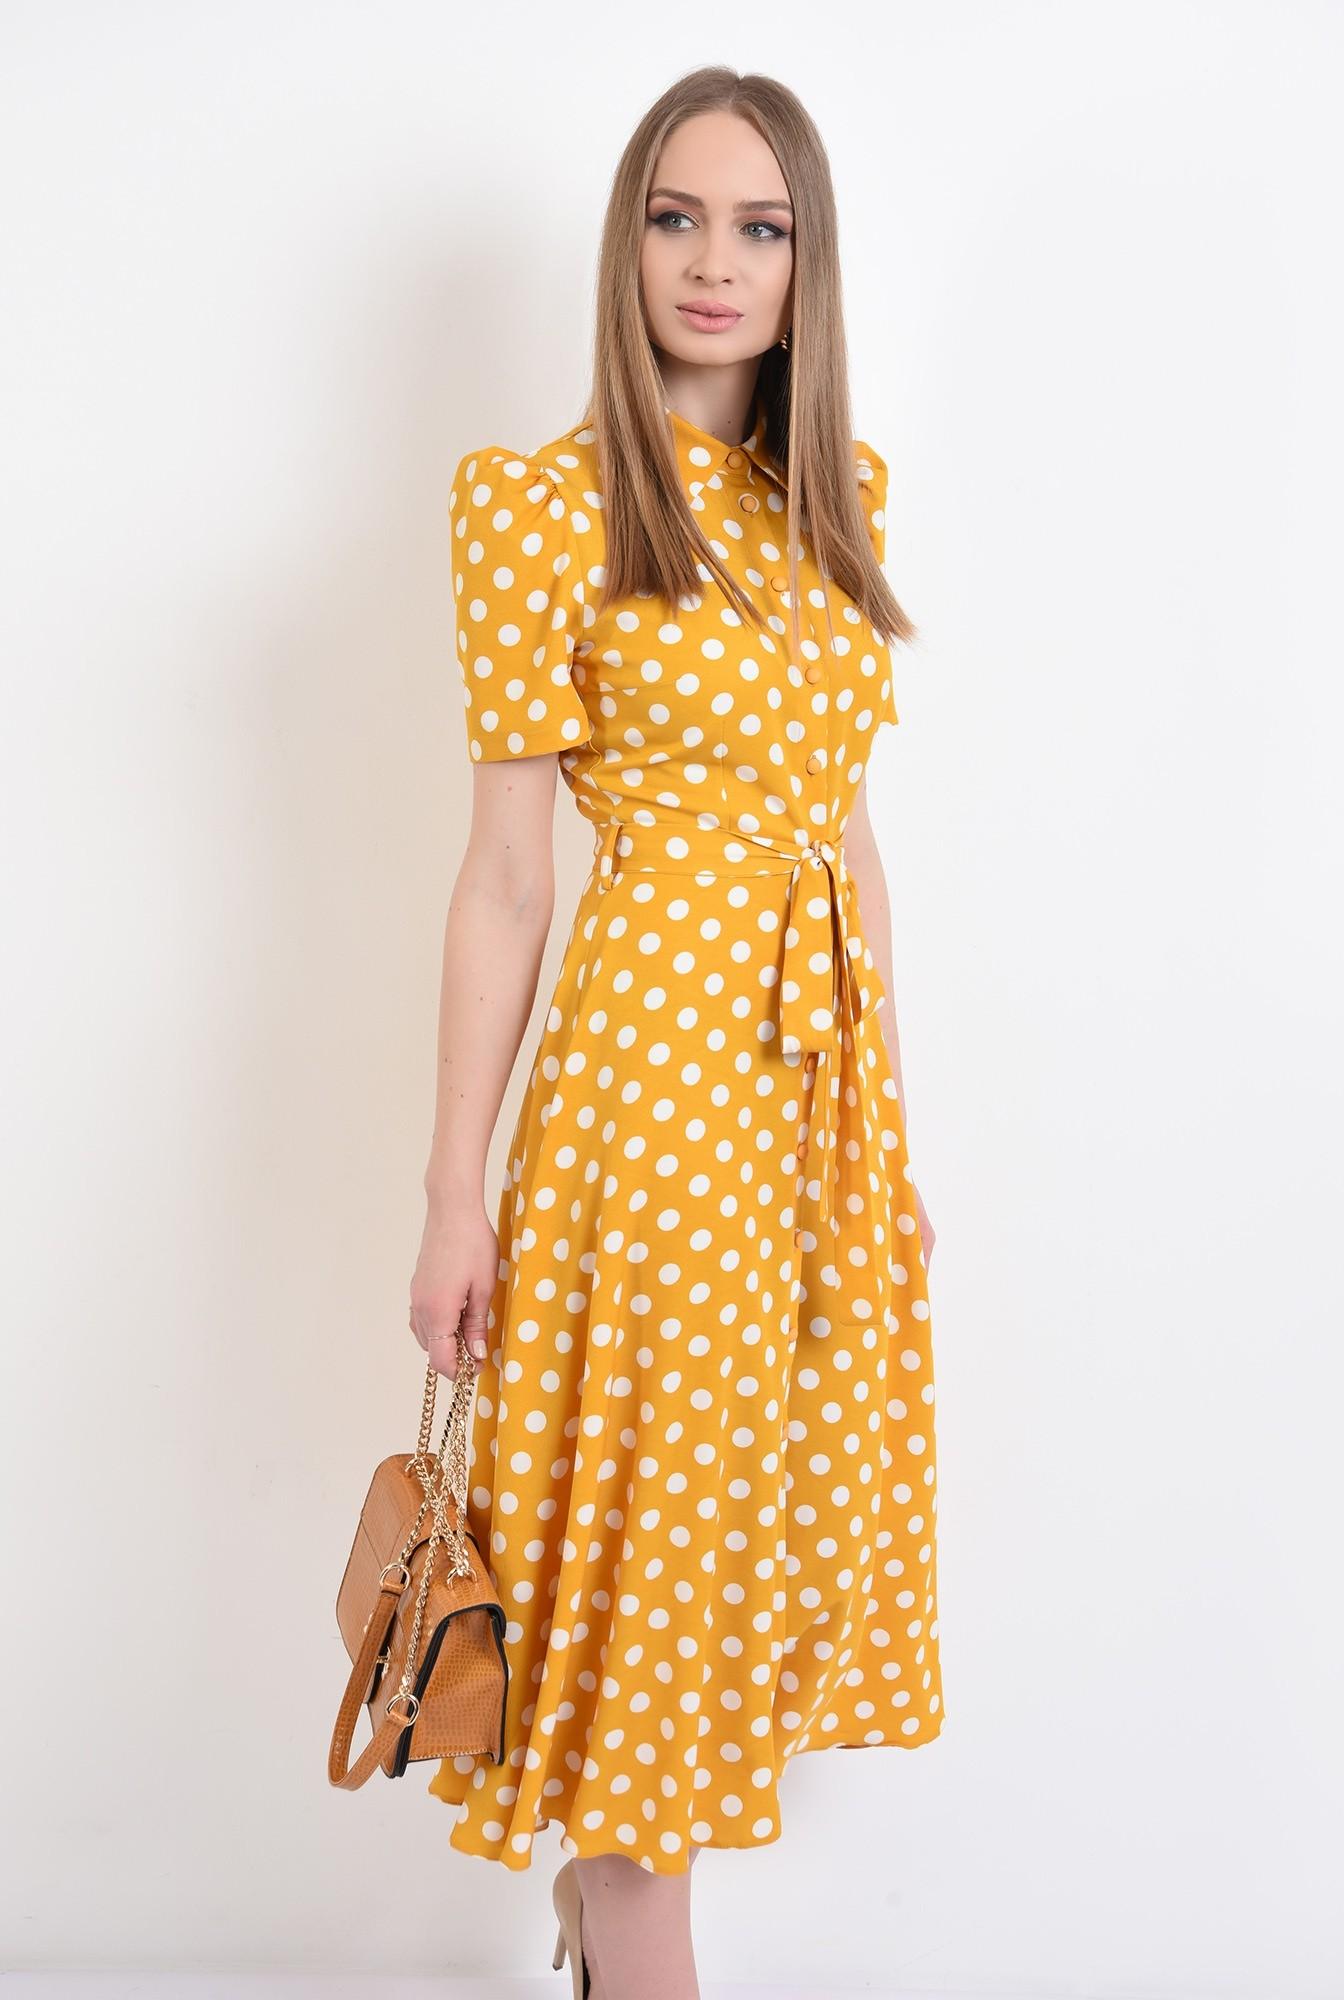 0 - 360 - rochie casual, evazata, cu nasturi, cu cordon, buline, Poema